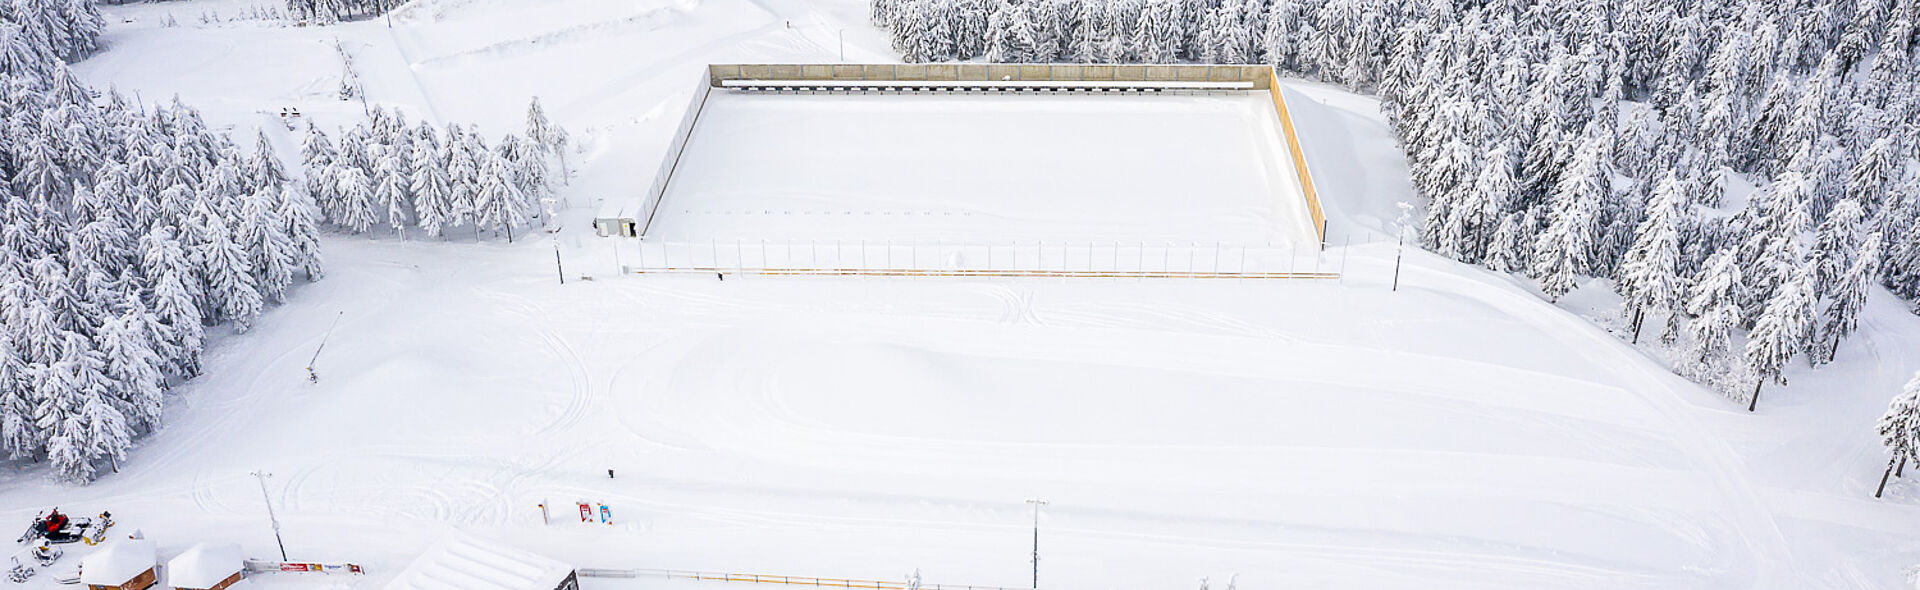 Biathlon Oberwiesenthal Sparkassen-Skiarena Trainingszentrum Training Center